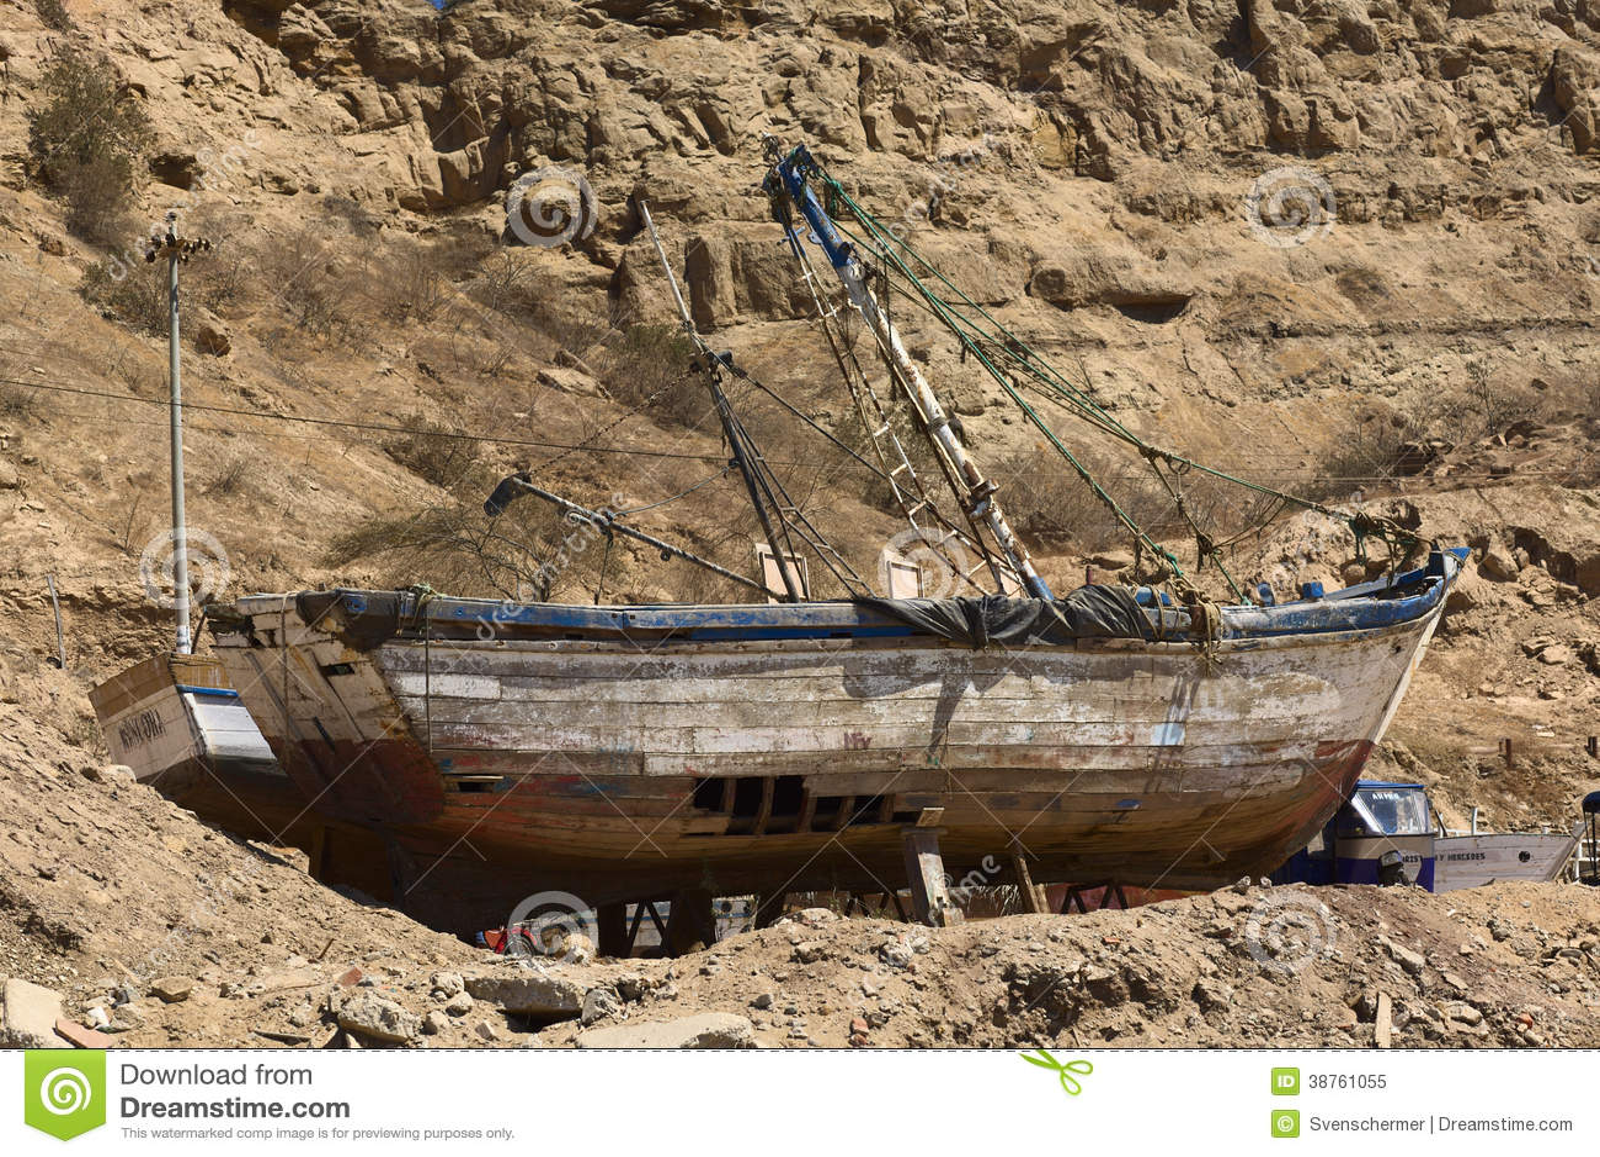 Old Wooden Fishing Boat In Mancora, Peru Editorial Image - Image: 38761055